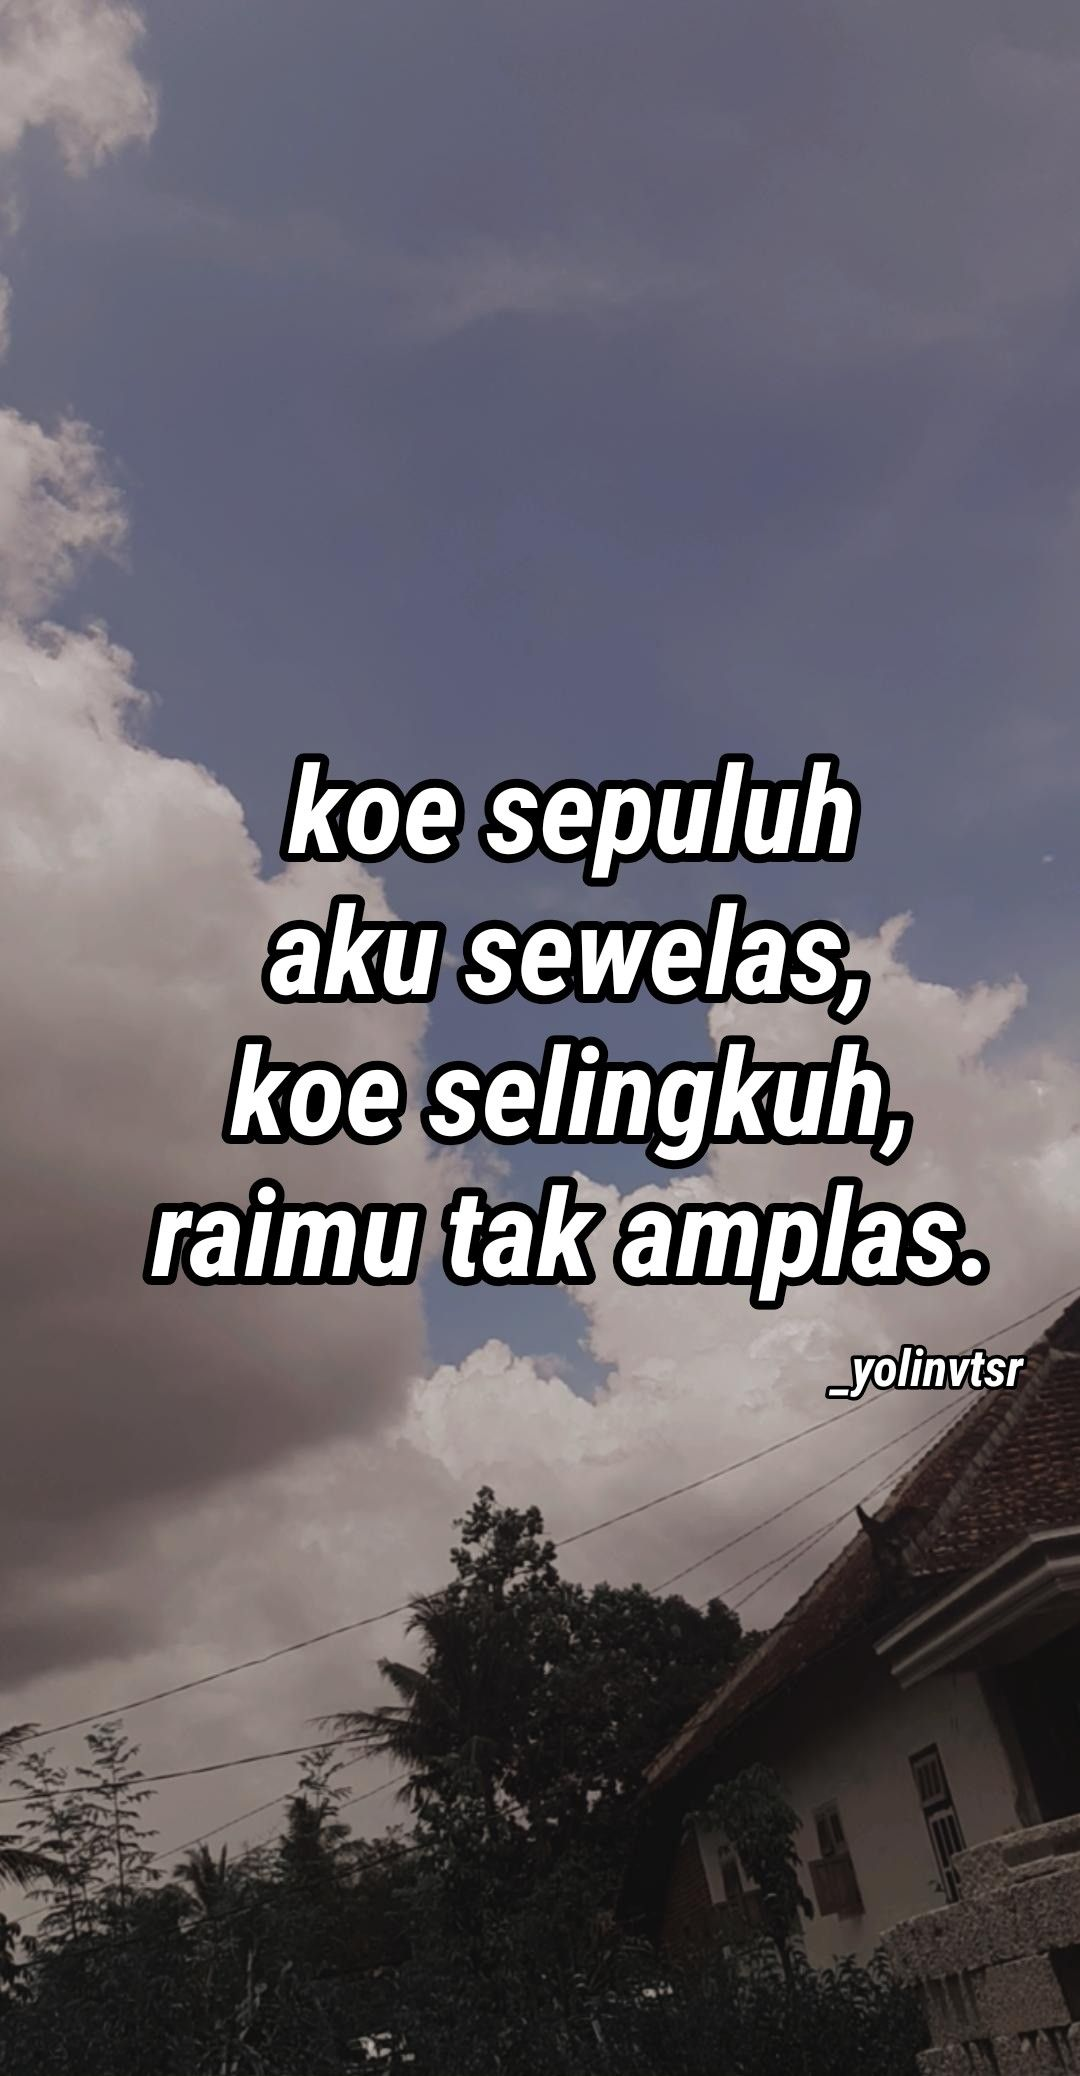 Cption Oleh Rosyilliaa Jj Ungkapan Lucu Kutipan Hidup Kutipan